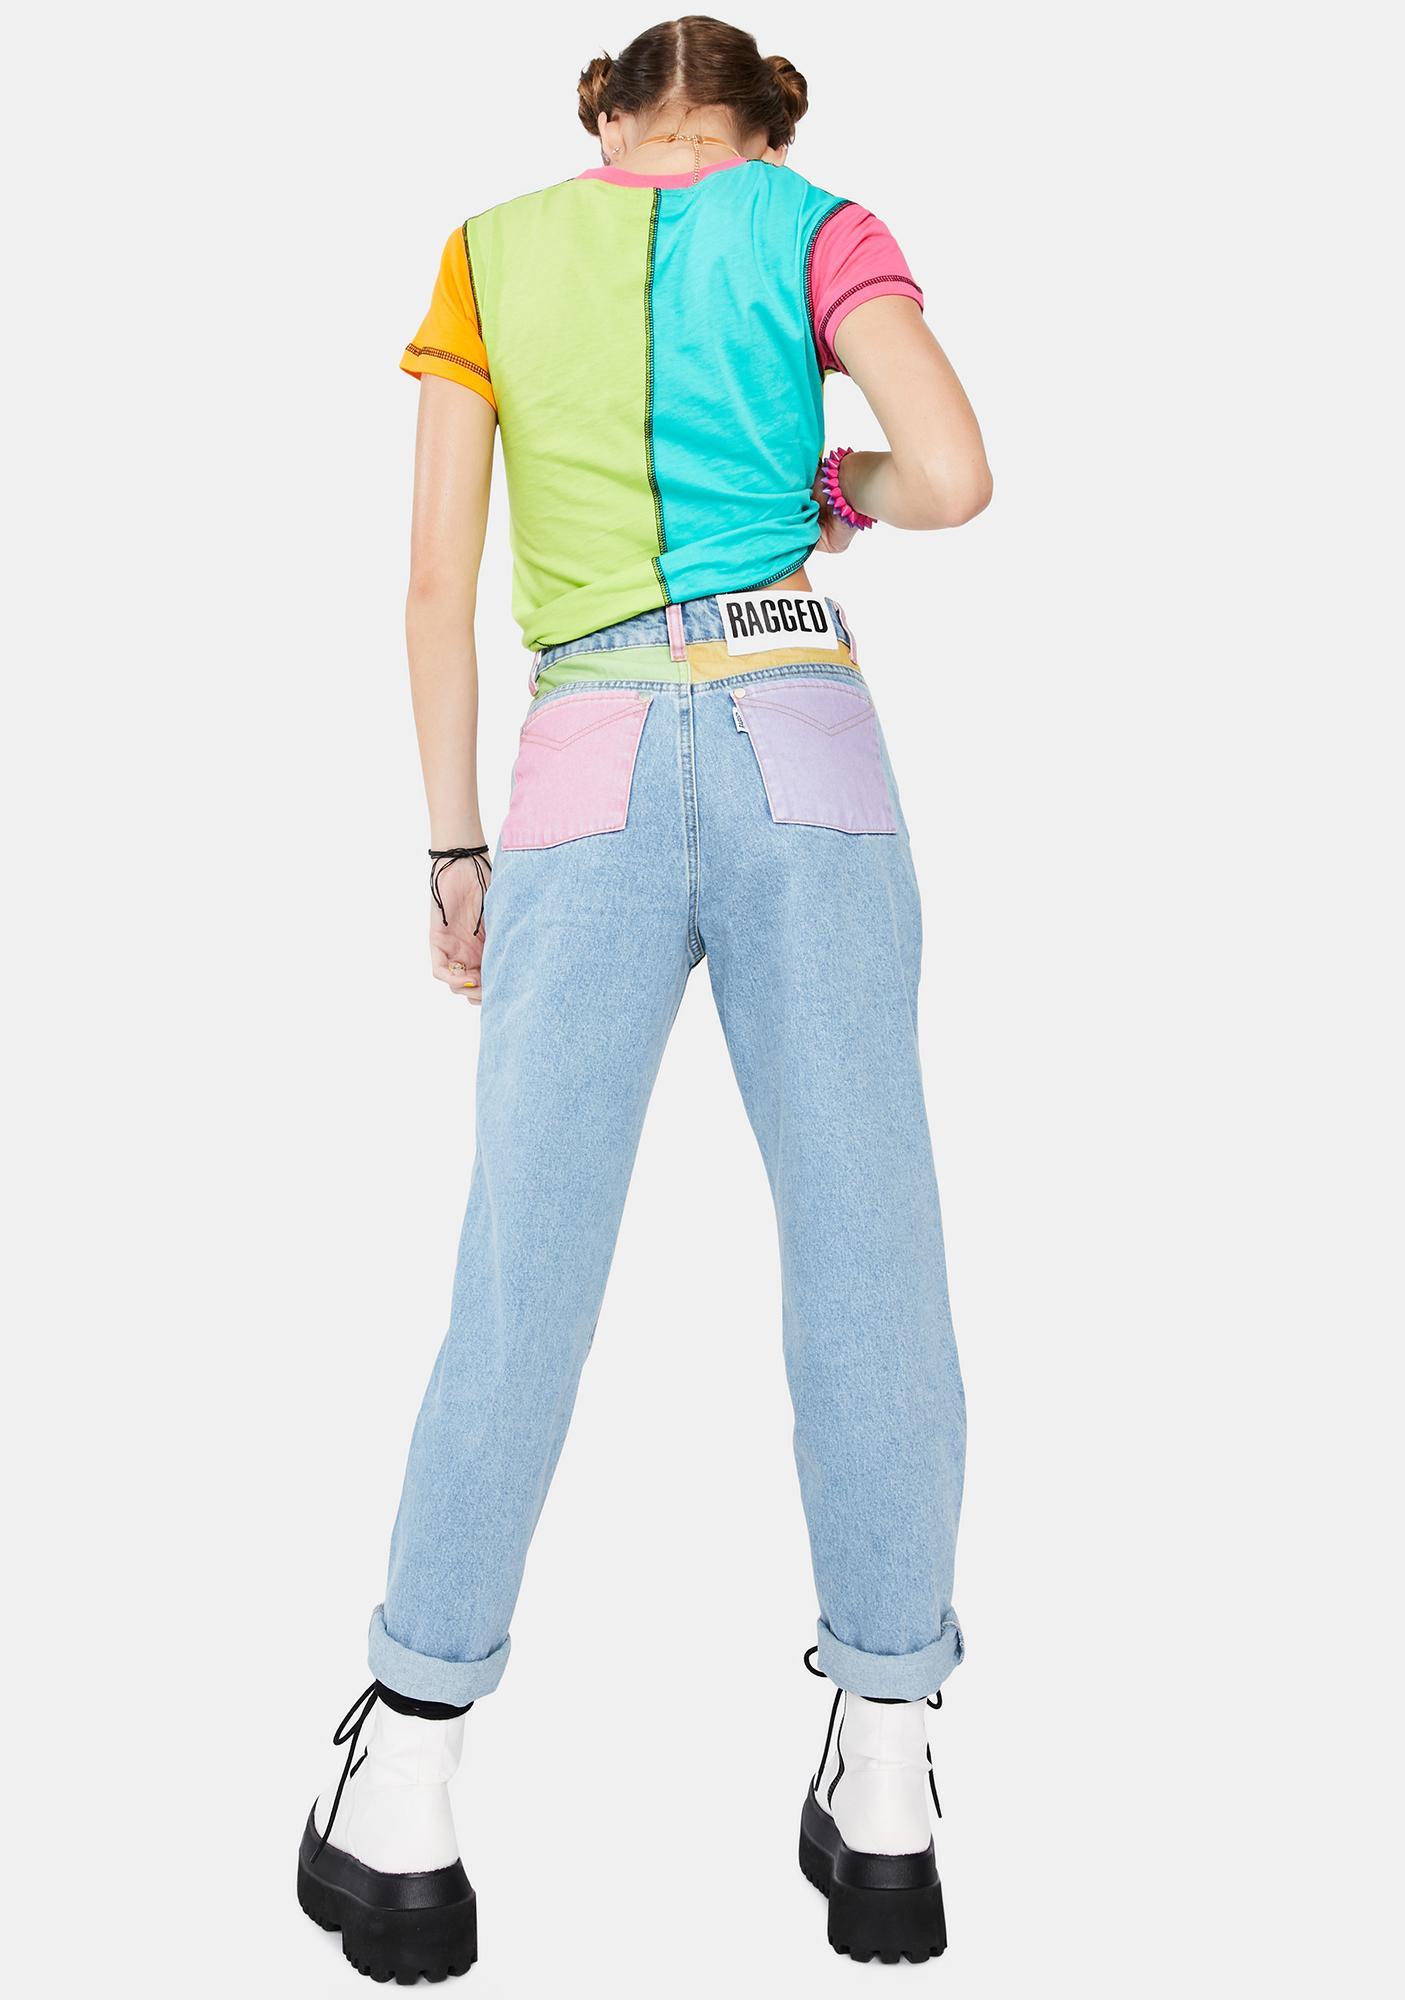 The Ragged Priest Illuminate Colorblock Pocket Mom Jeans